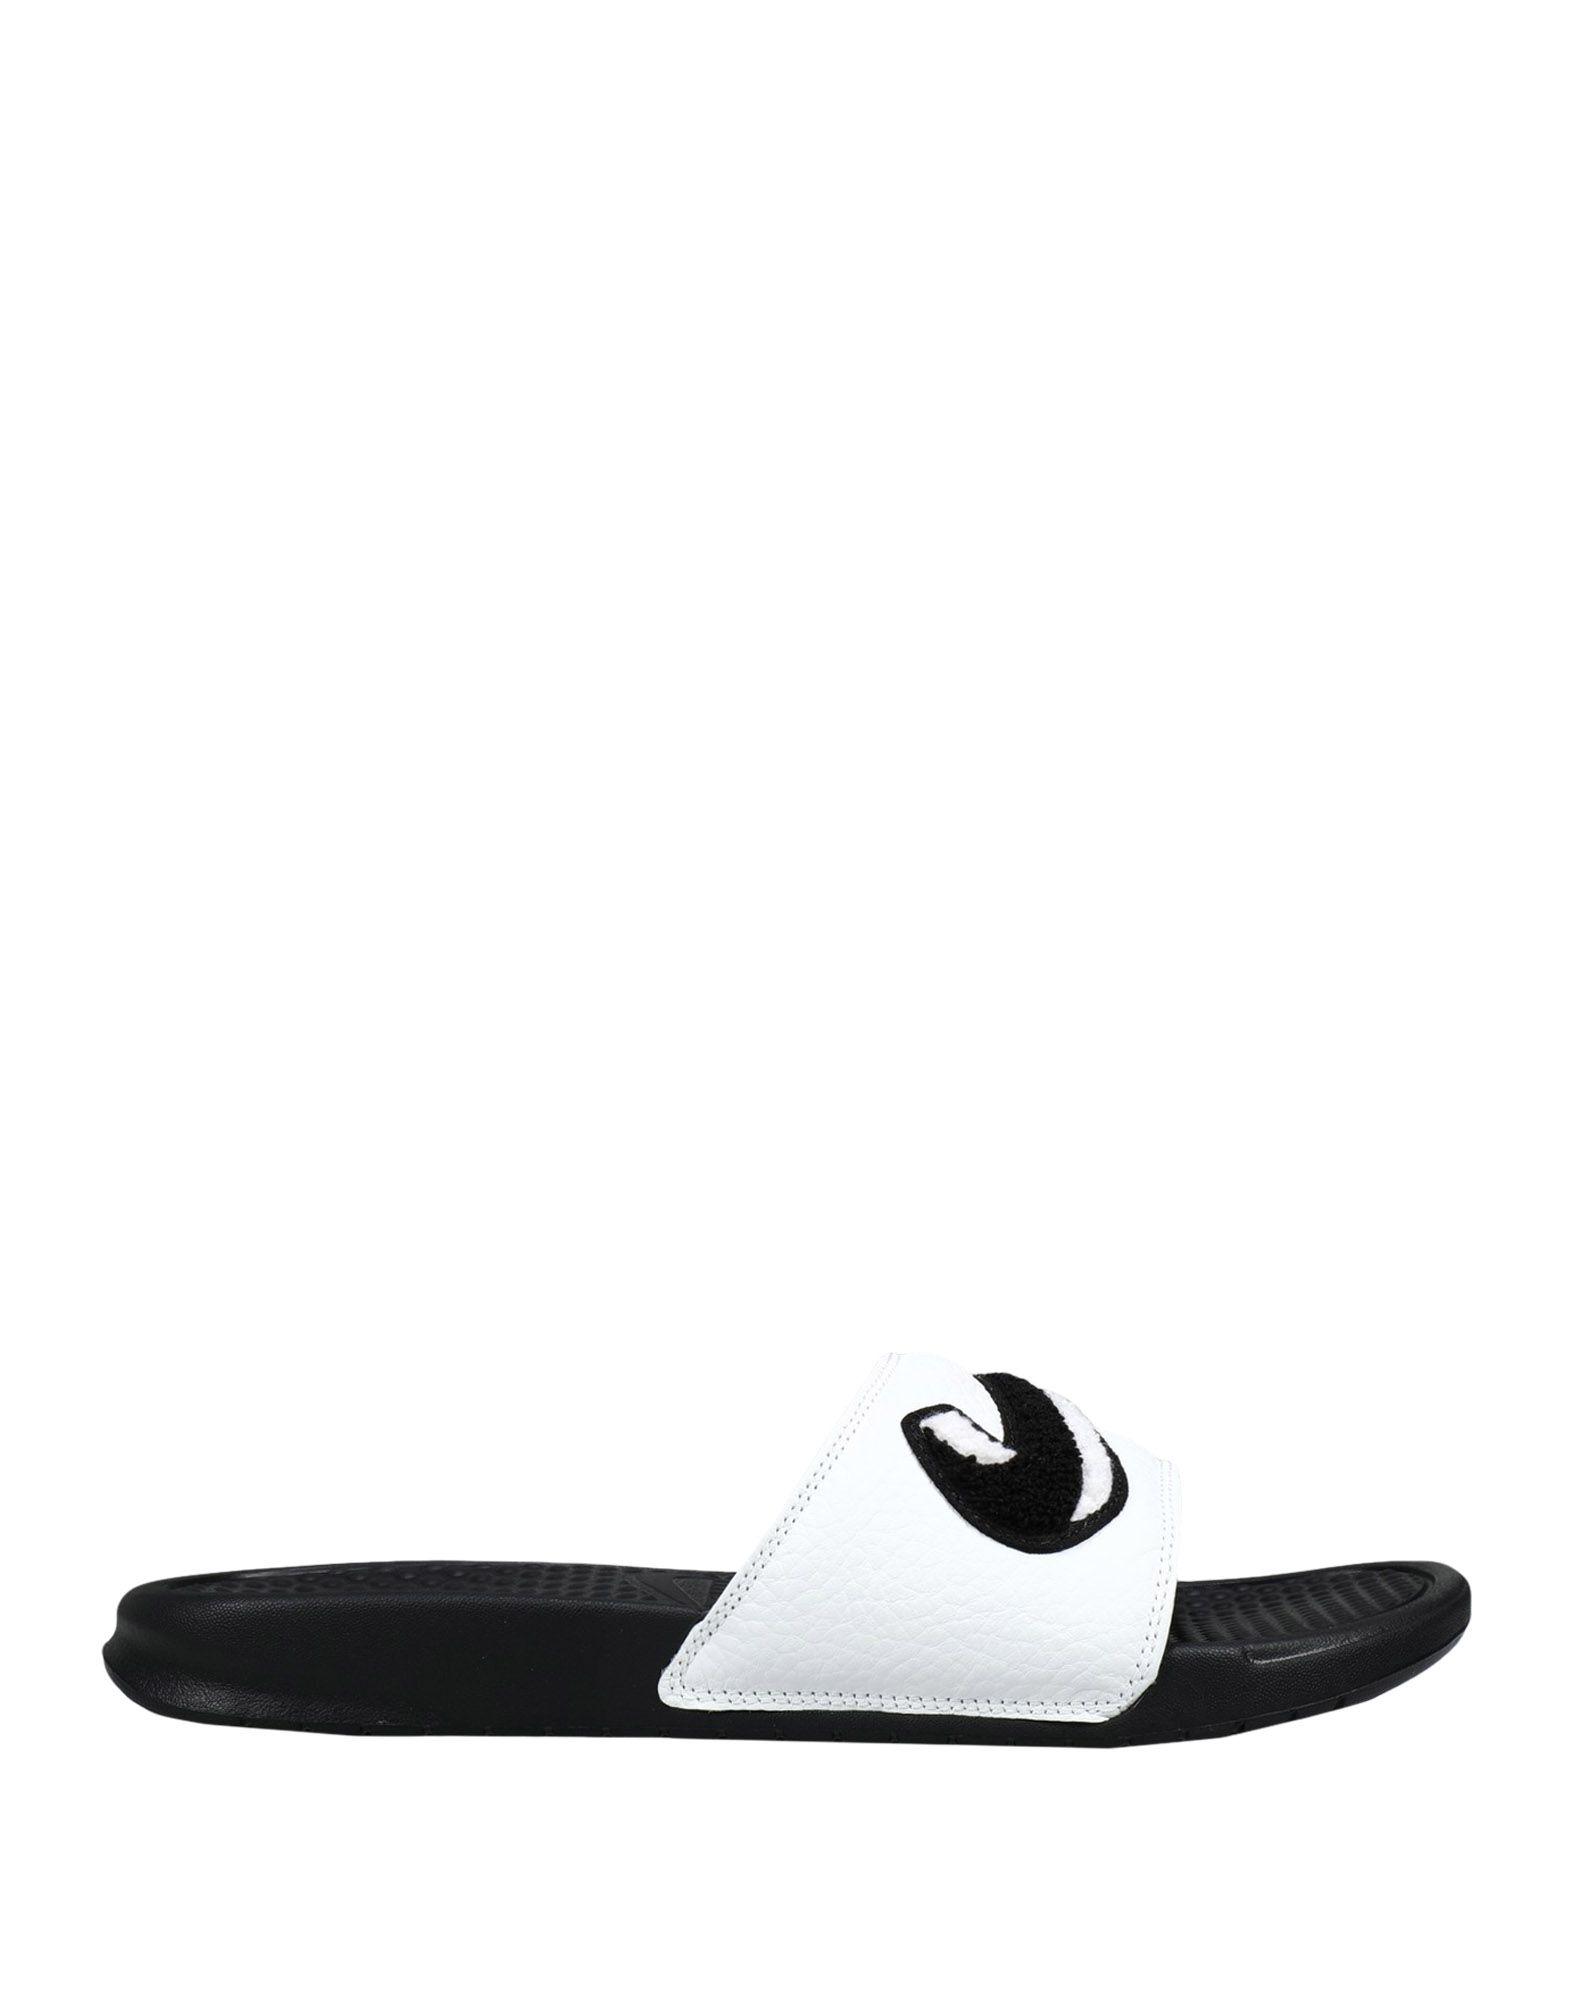 Sandali Nike -   Benassi Jdi Chenille - Nike Uomo - 11535965RD ad6ecd